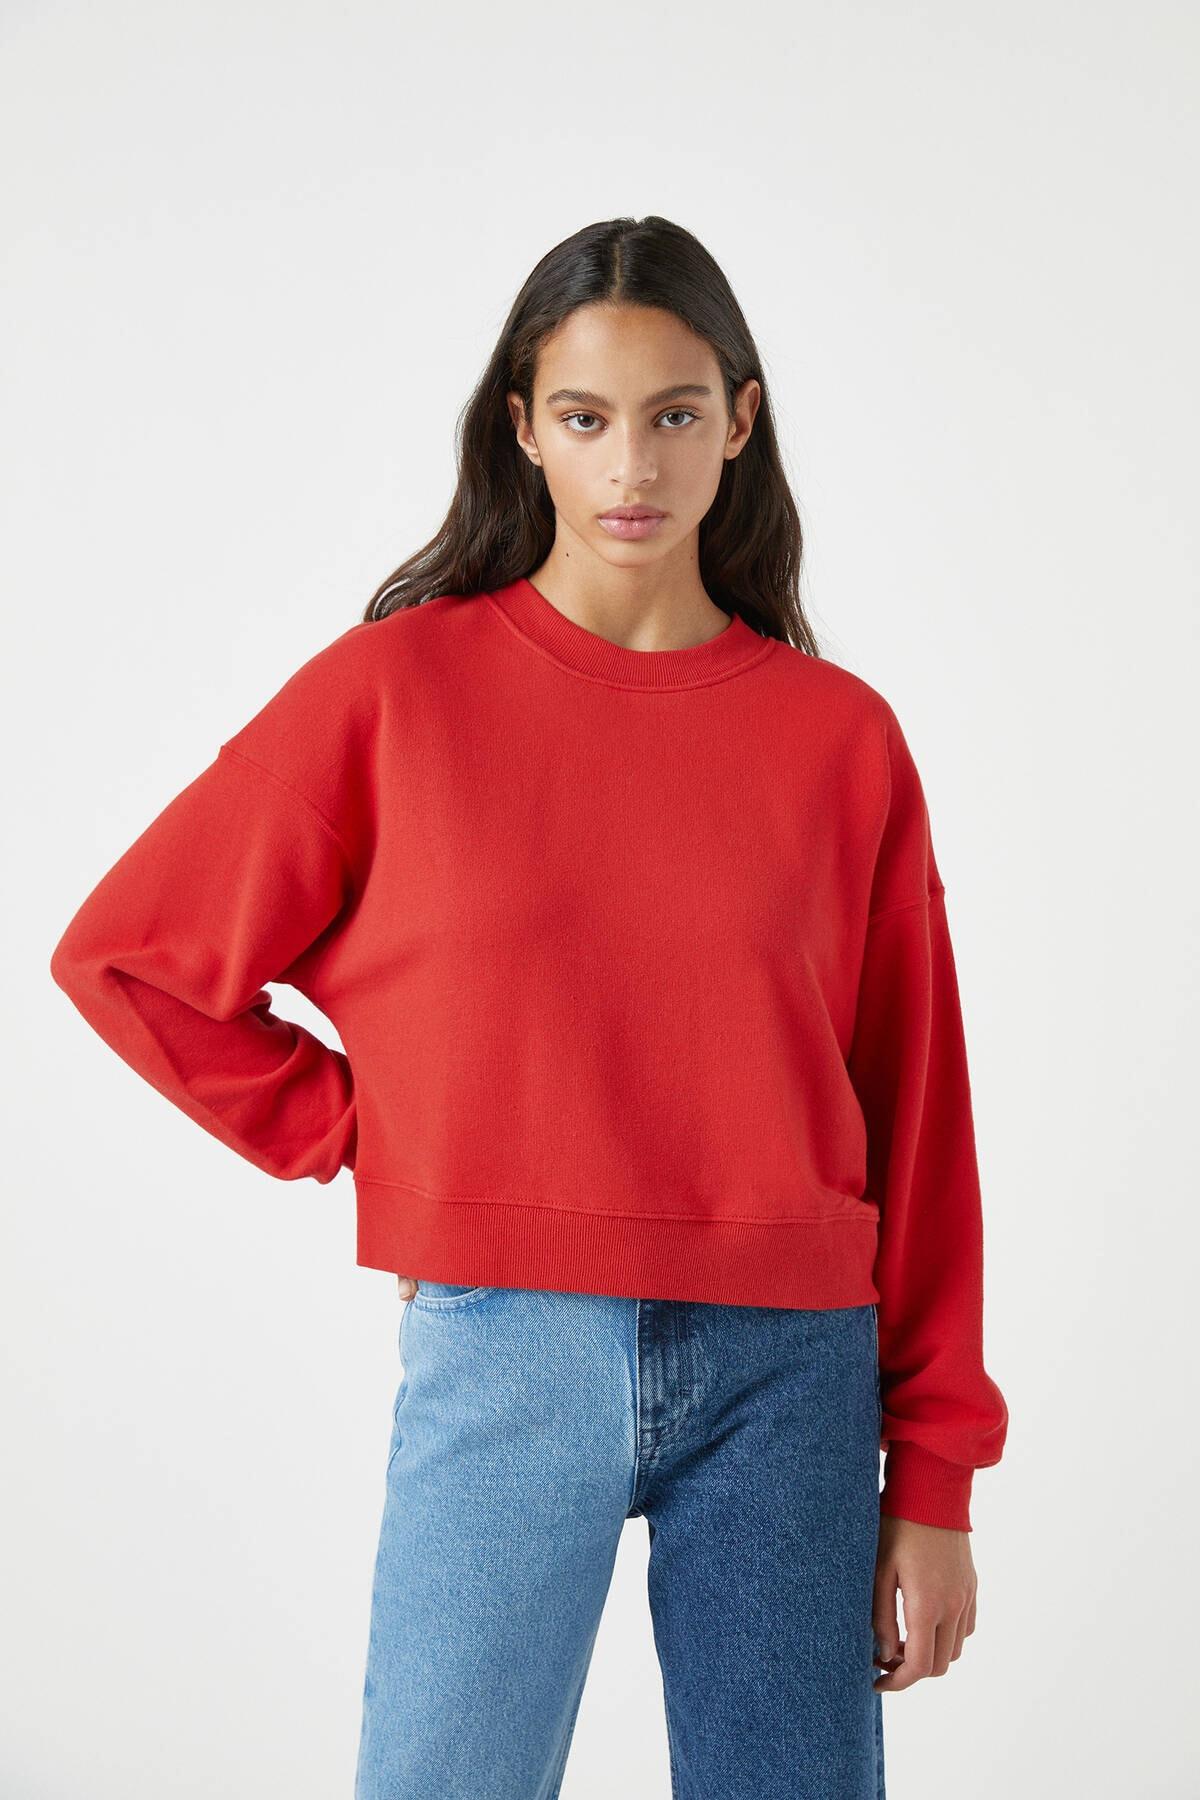 Pull & Bear Kadın Kırmızı Geniş Fitilli Şeritli Basic Sweatshirt. 05596402